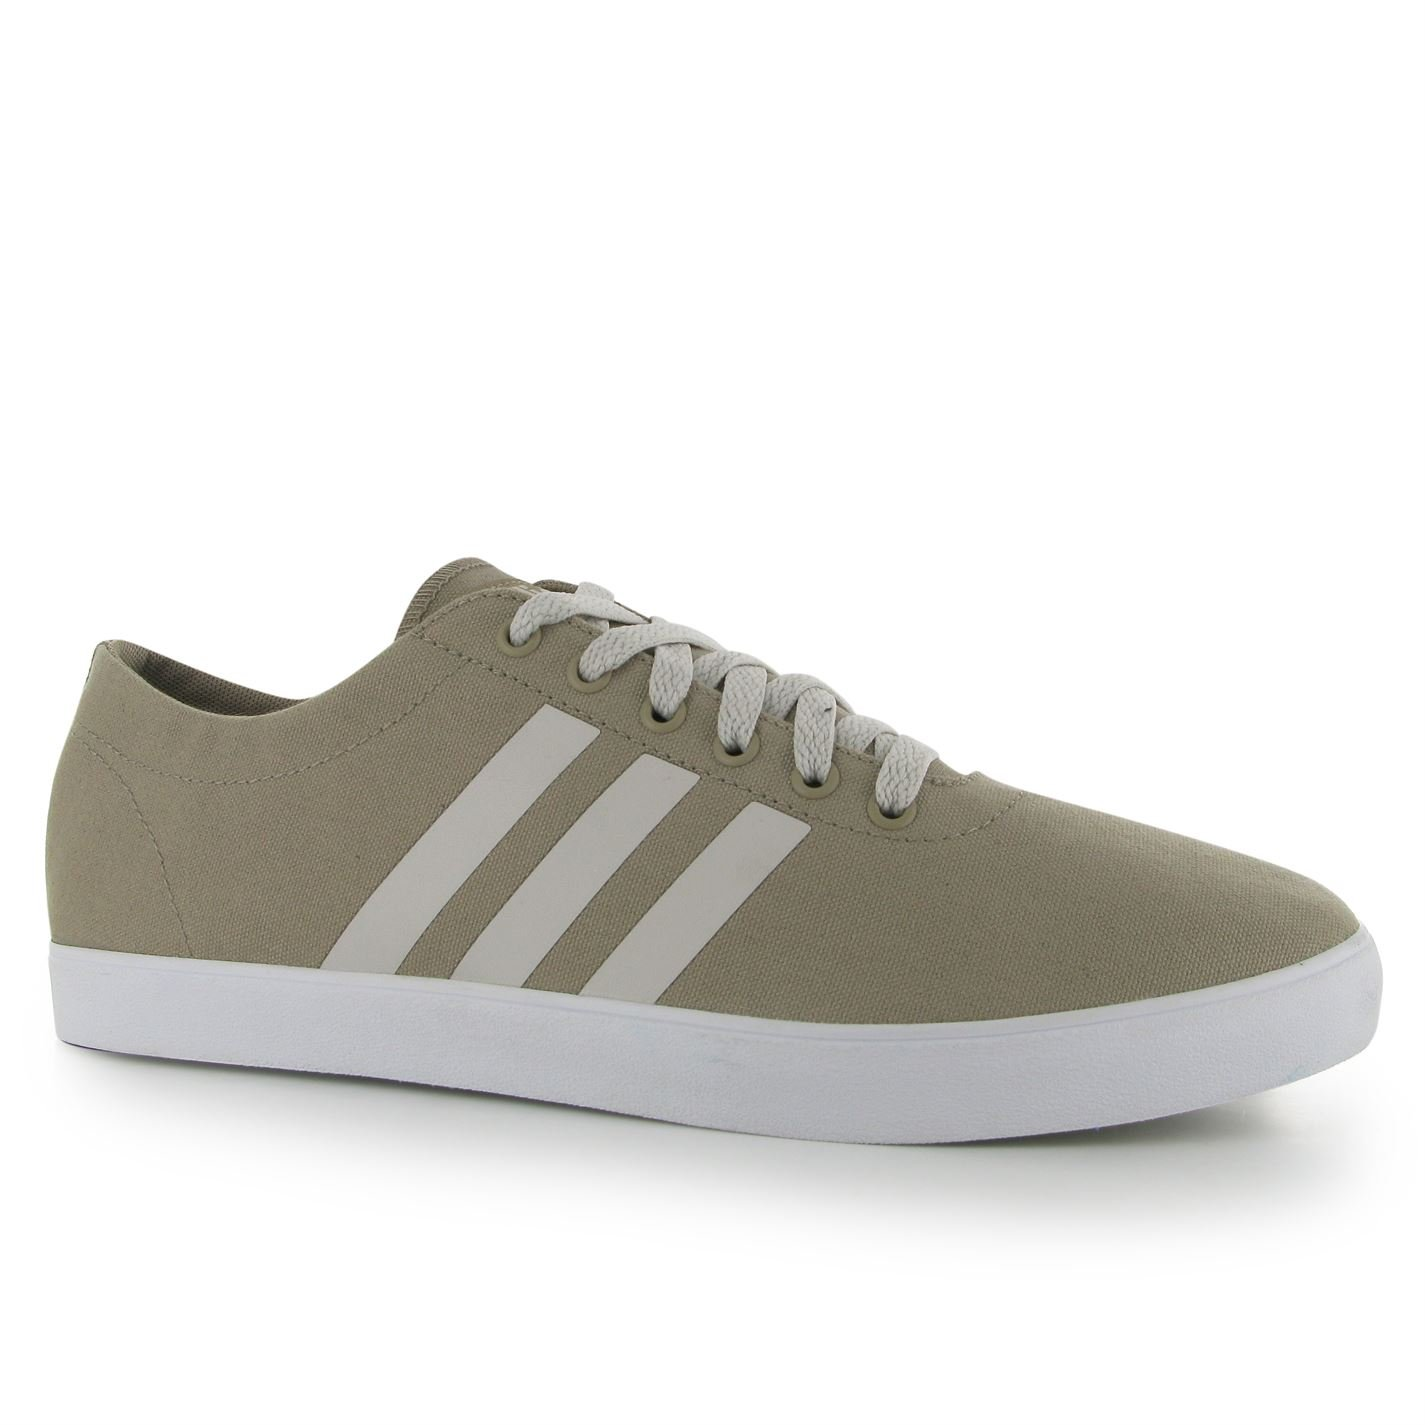 adidas Easy VULK Scarpe da Uomo, Stringate, in Tela, con